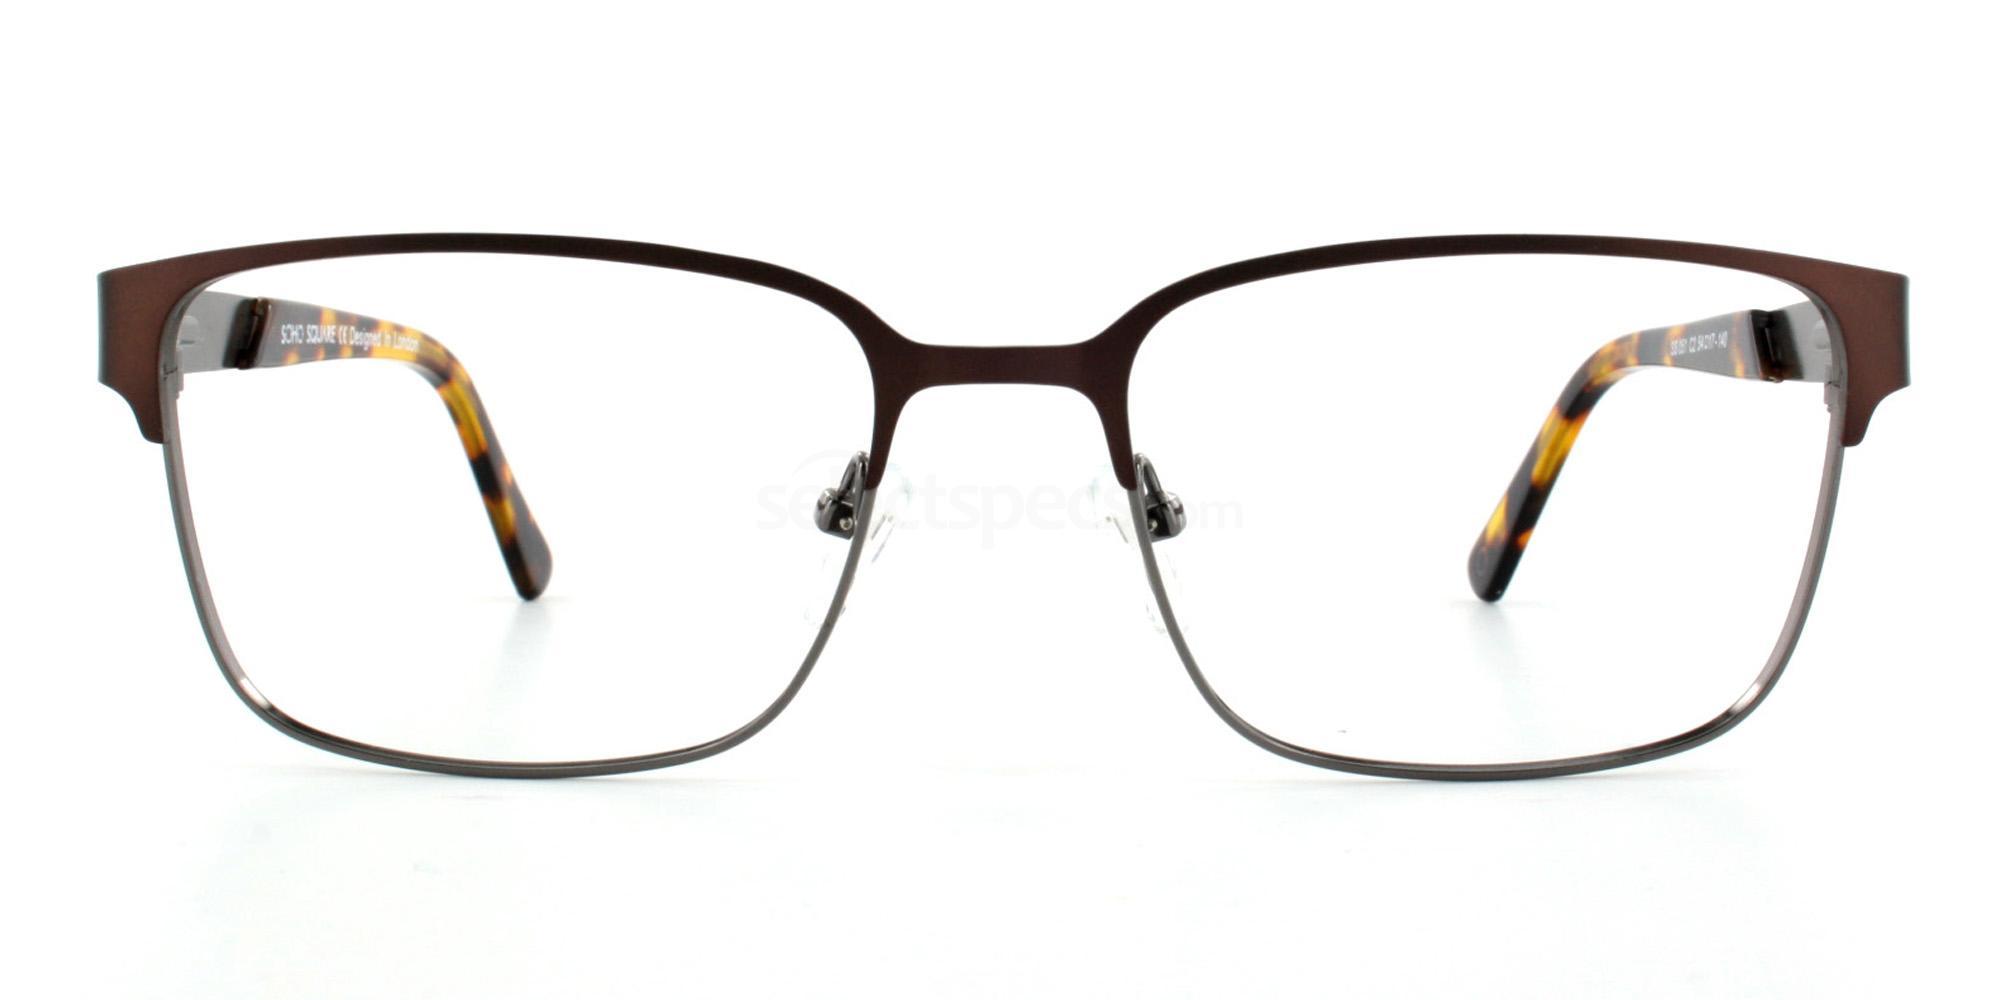 C2 SS 051 Glasses, Soho Square